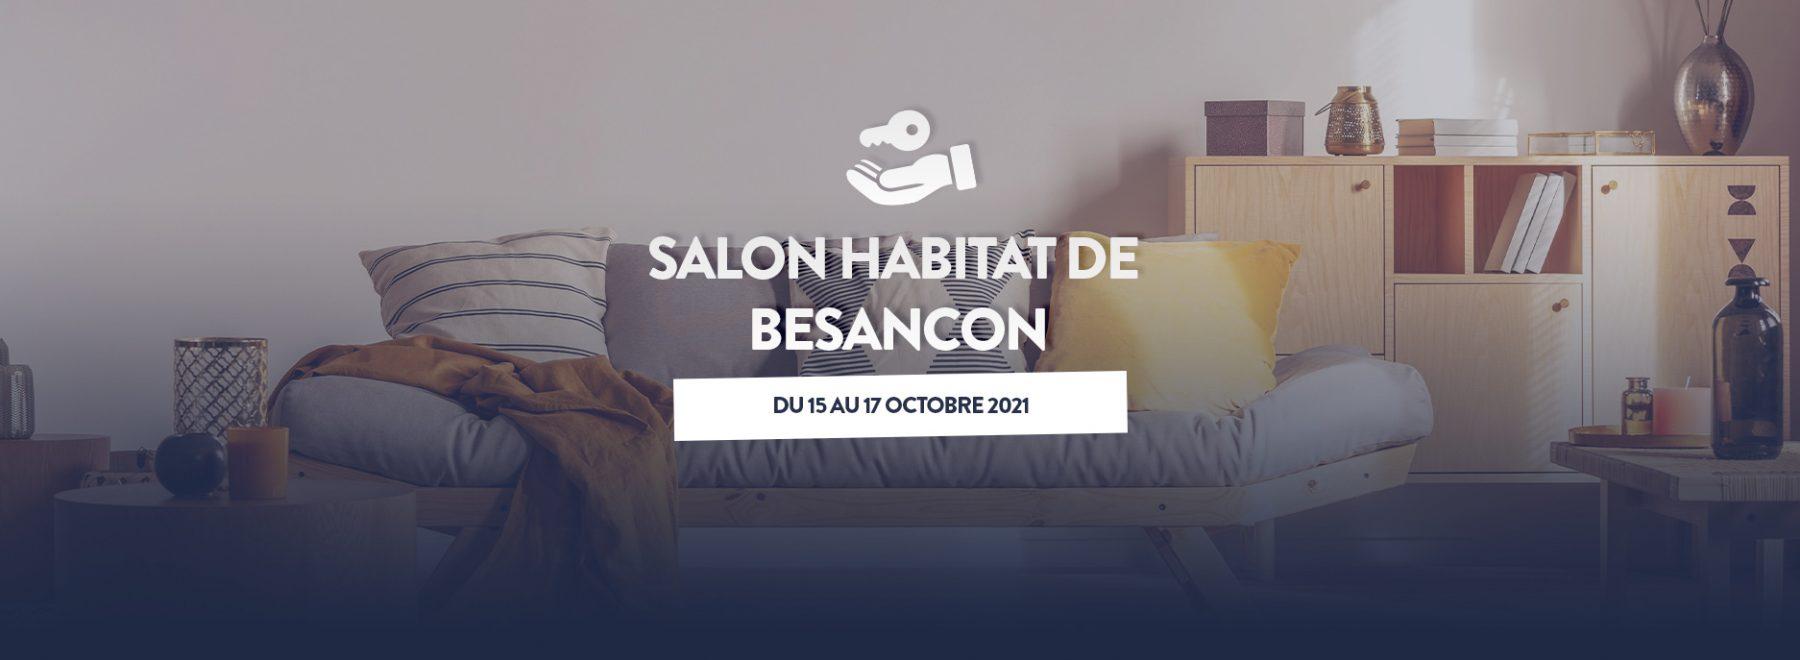 salon habitat besancon 2021